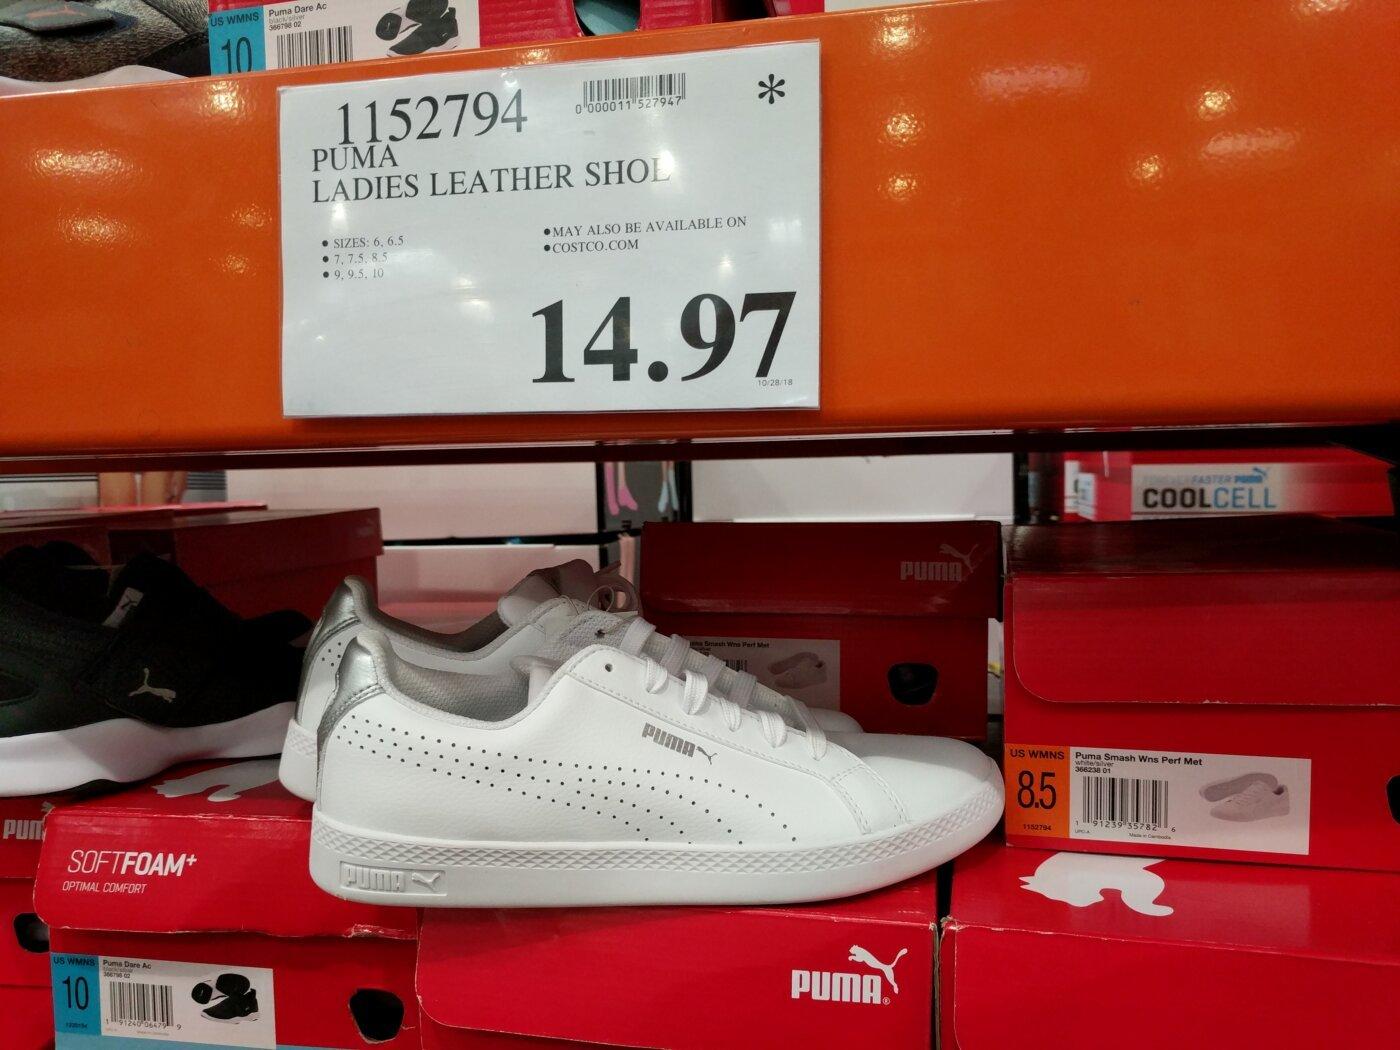 b0379efe8721 Puma ladies leather shoe jpg 4048x3036 Costco puma shoes